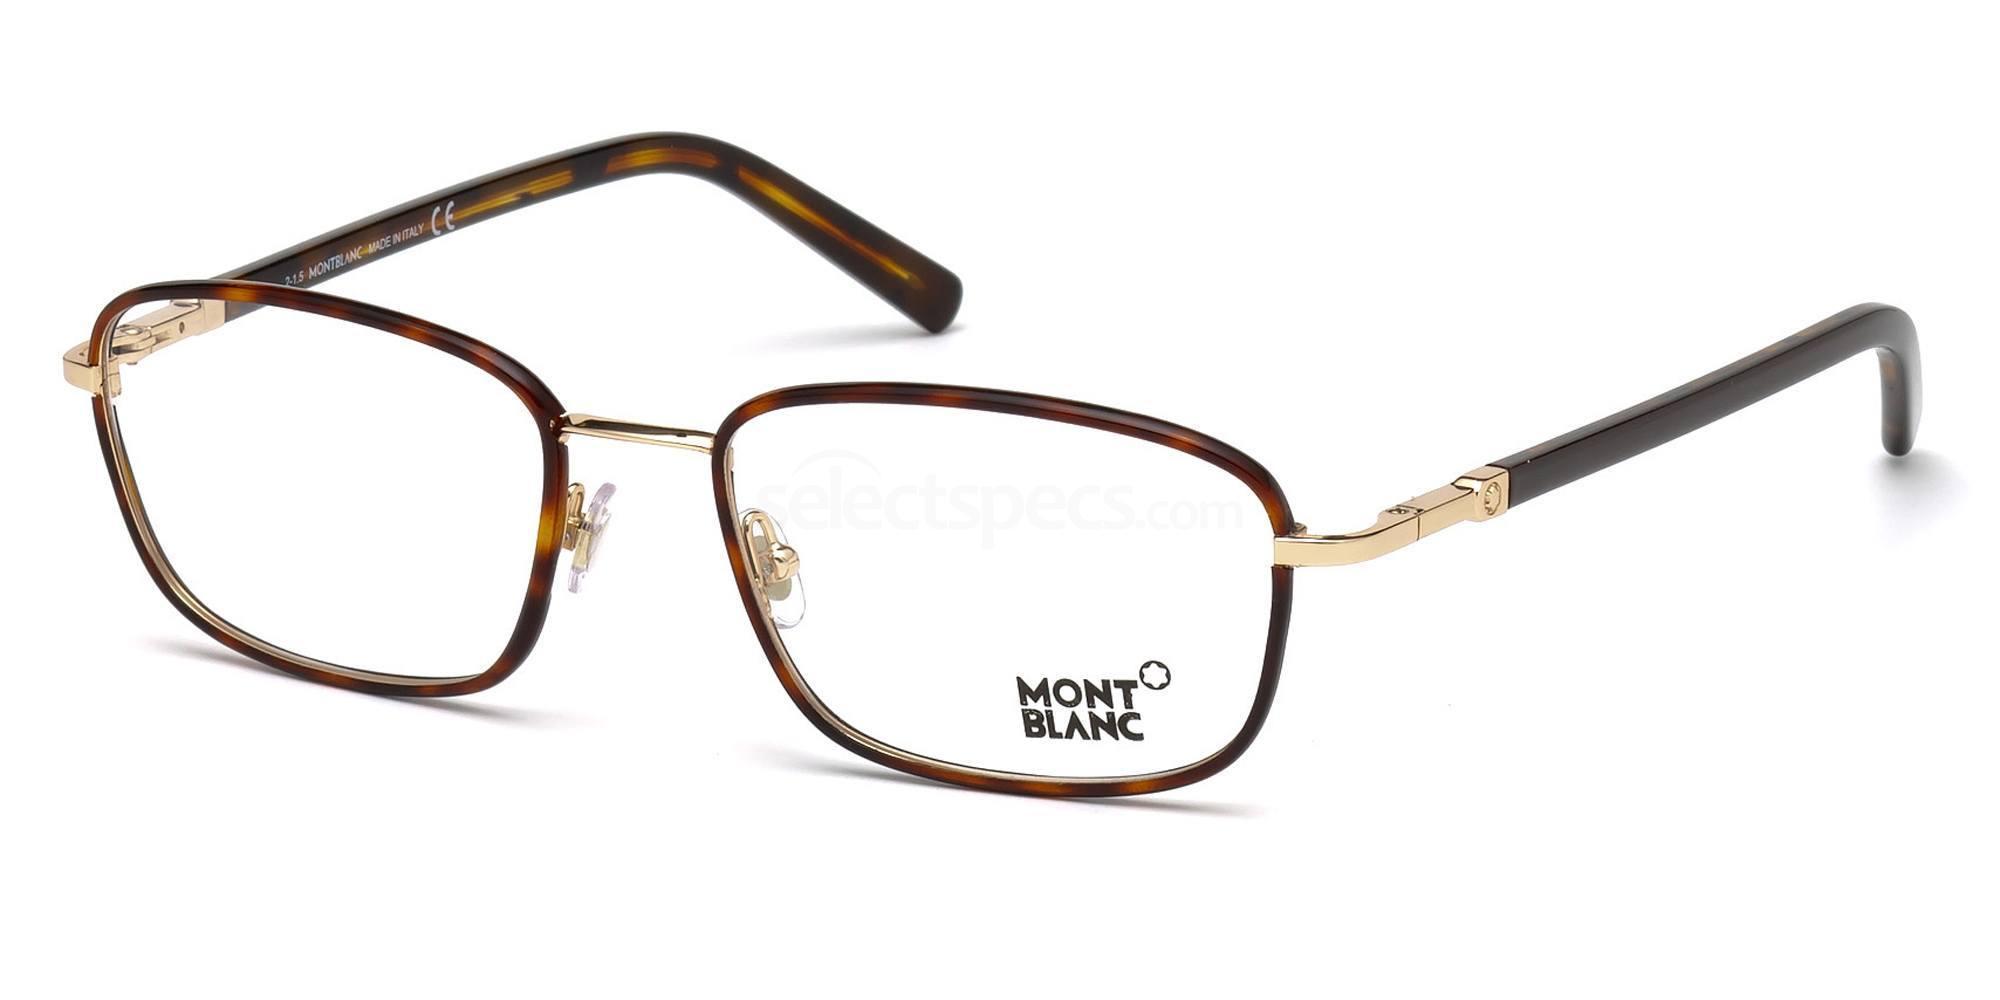 055 MB0556 Glasses, Mont Blanc